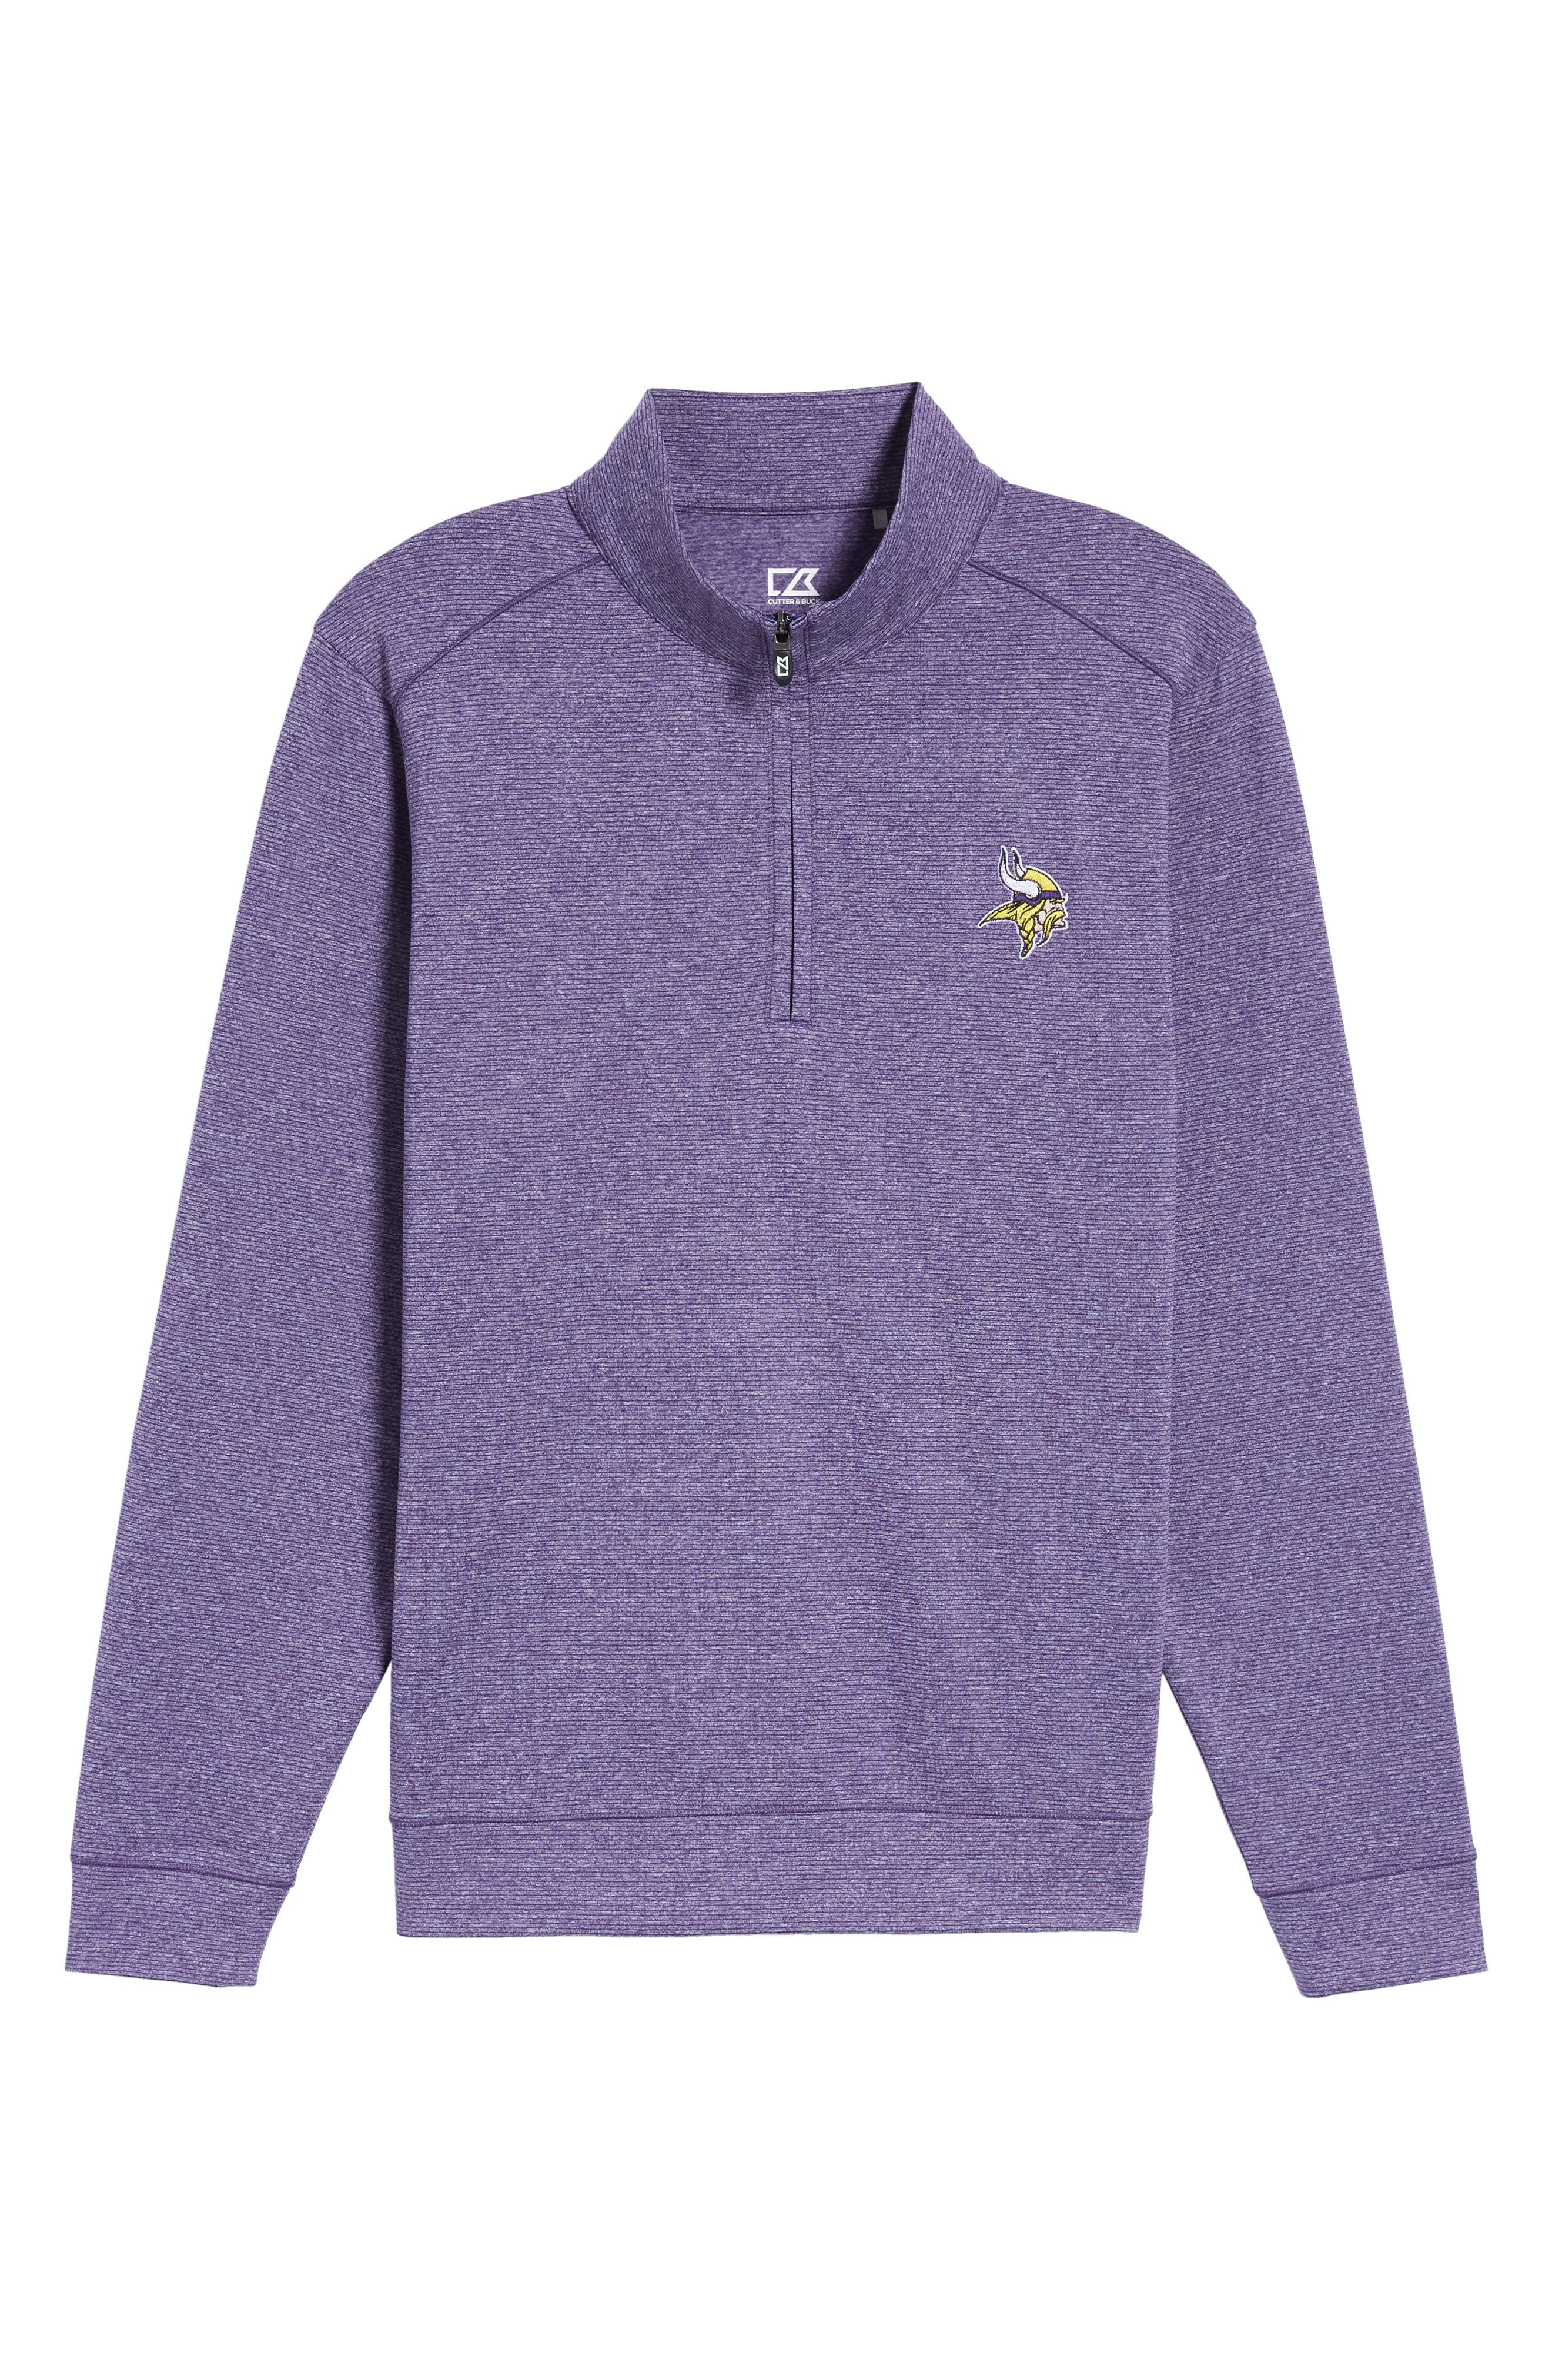 Shoreline - Minnesota Vikings Half Zip Pullover,                             Alternate thumbnail 6, color,                             College Purple Heather